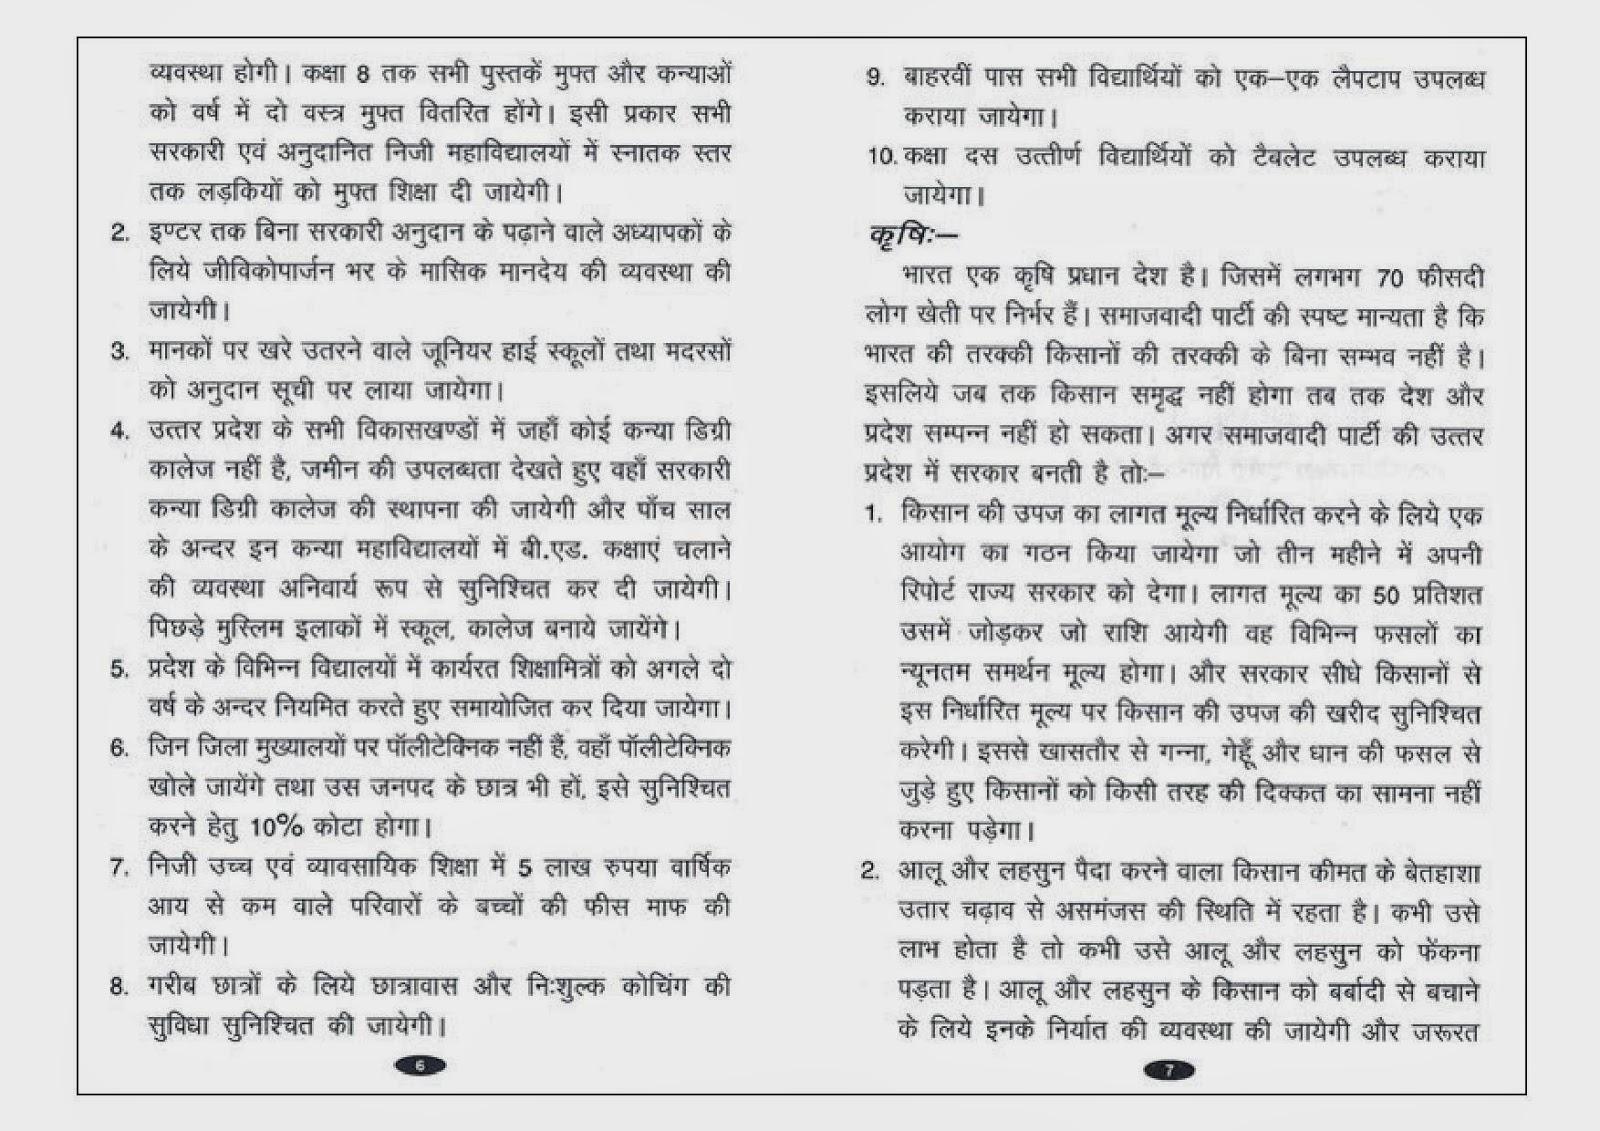 Manifesto Image: Manifestos Of Political Parties In India : Smajwadi Party